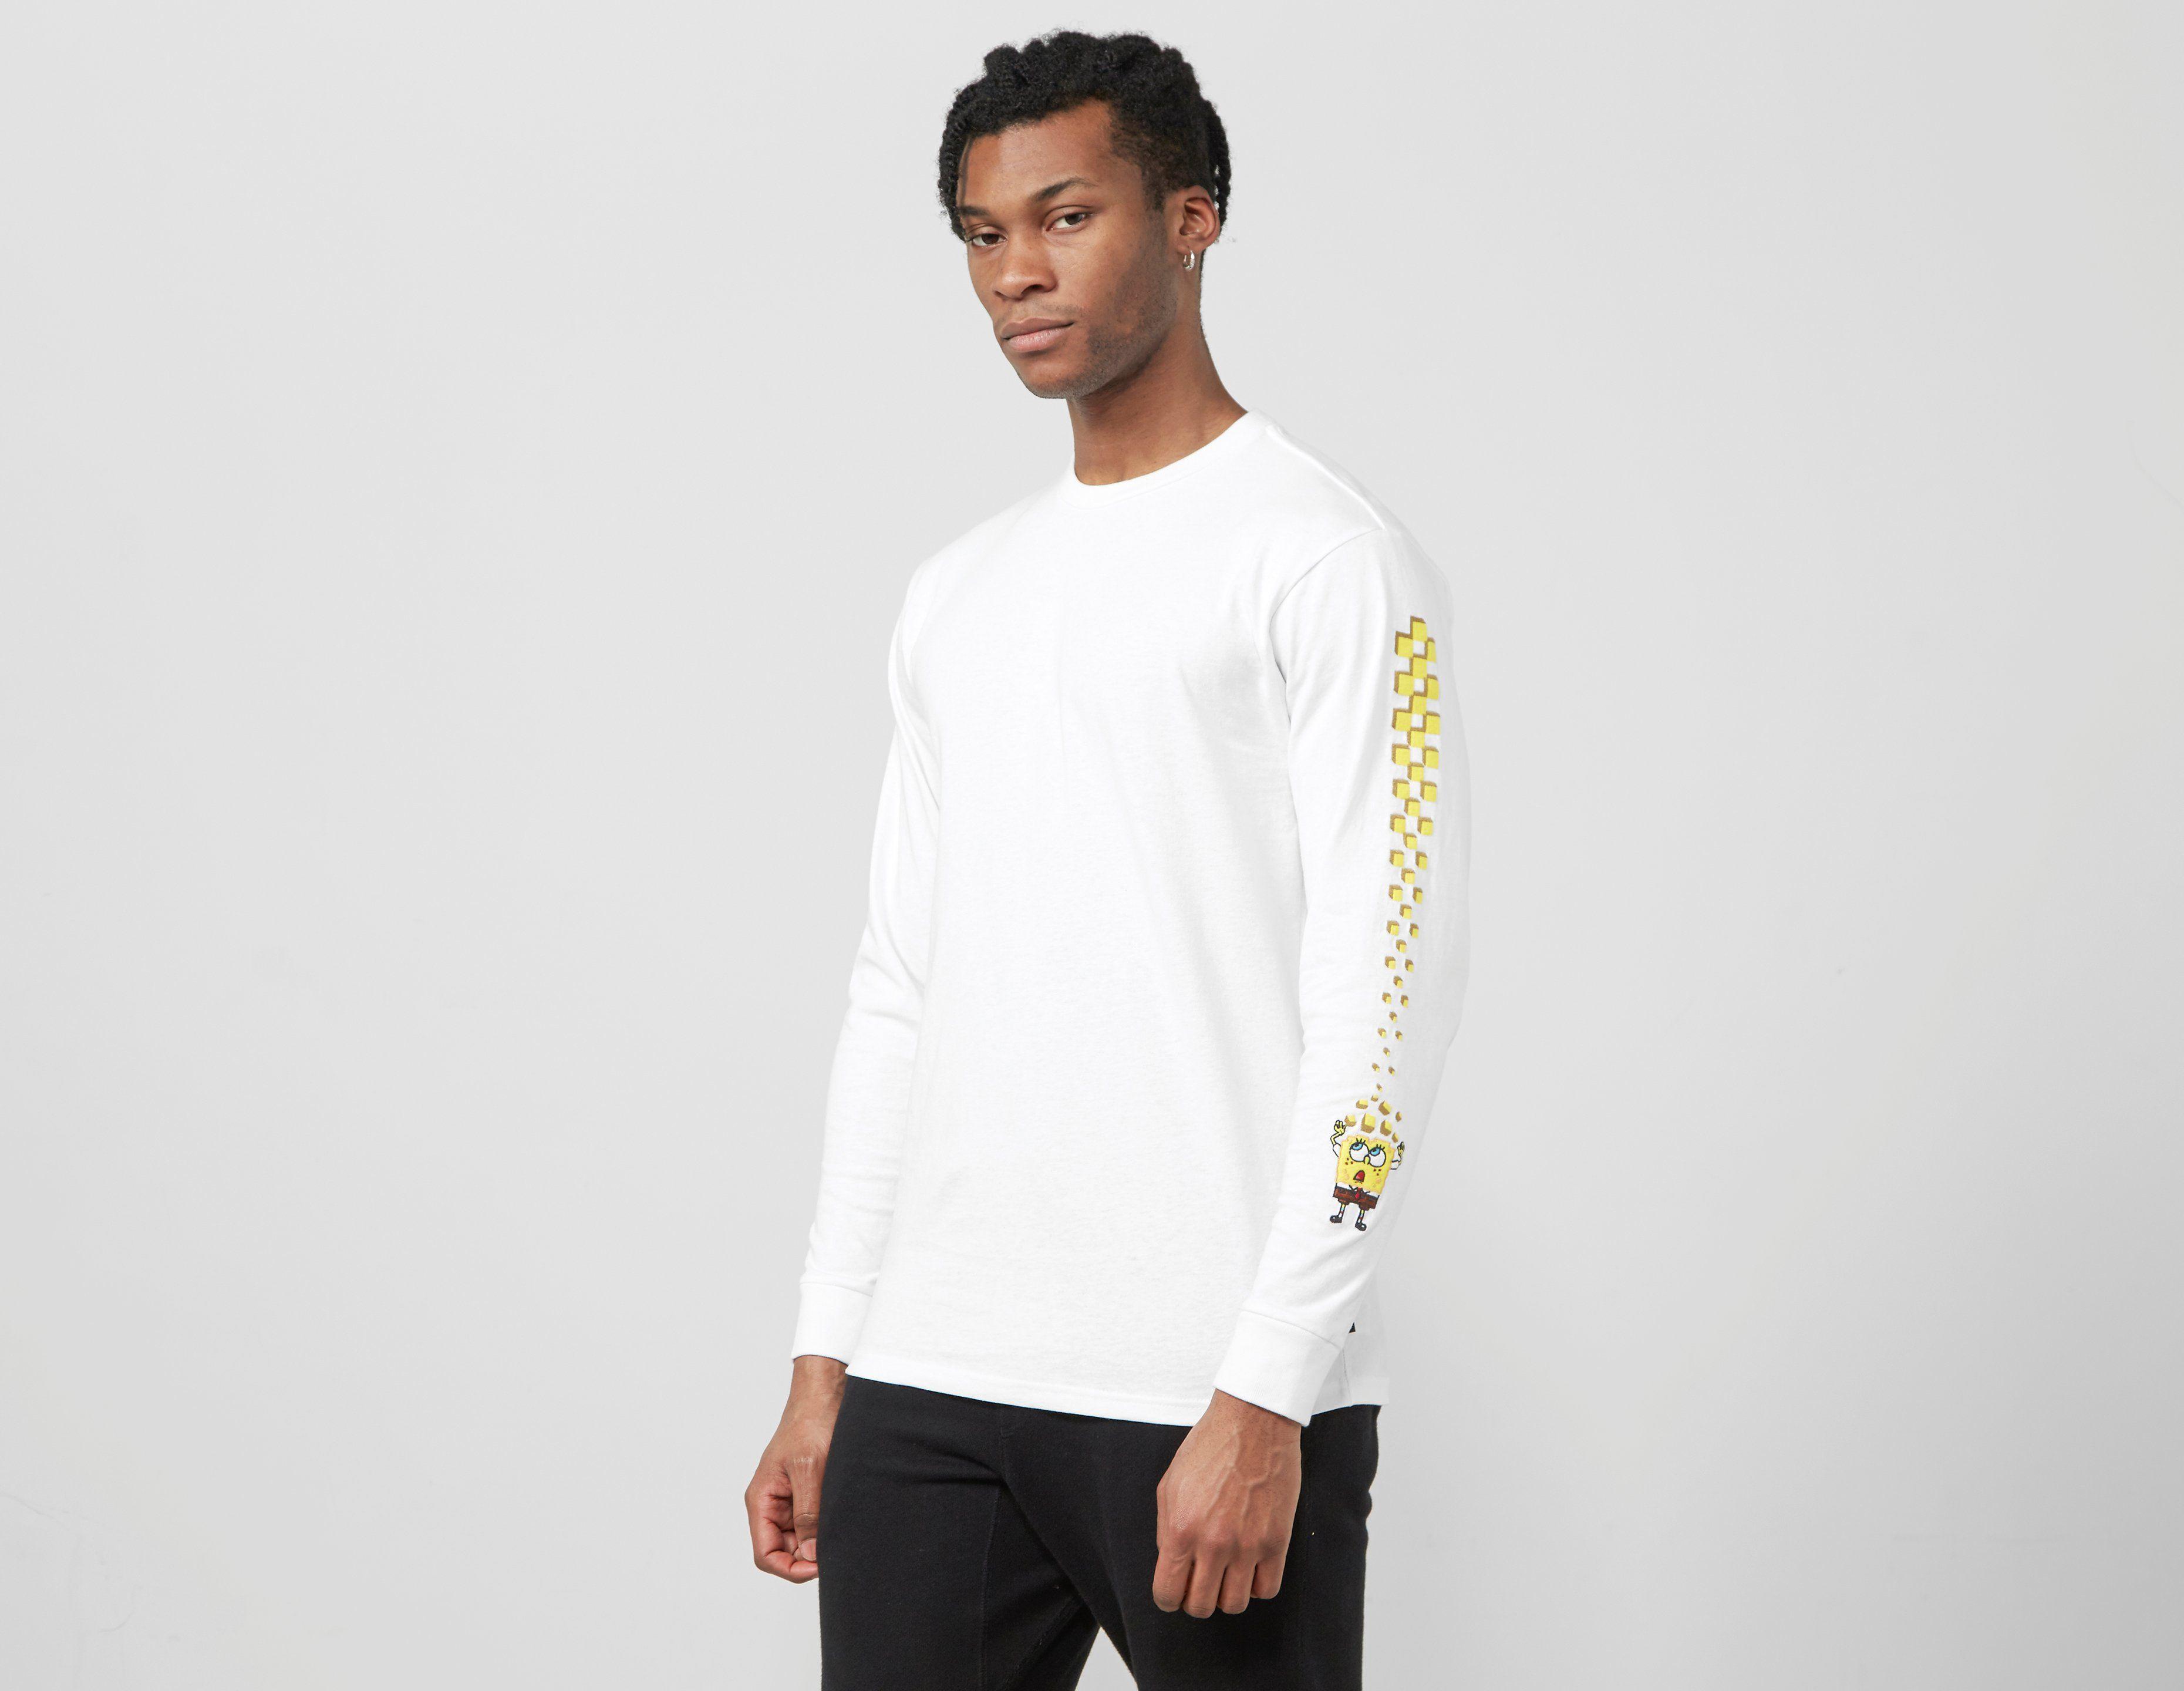 Vault by Vans x Spongebob Squarepants Long Sleeved T-Shirt